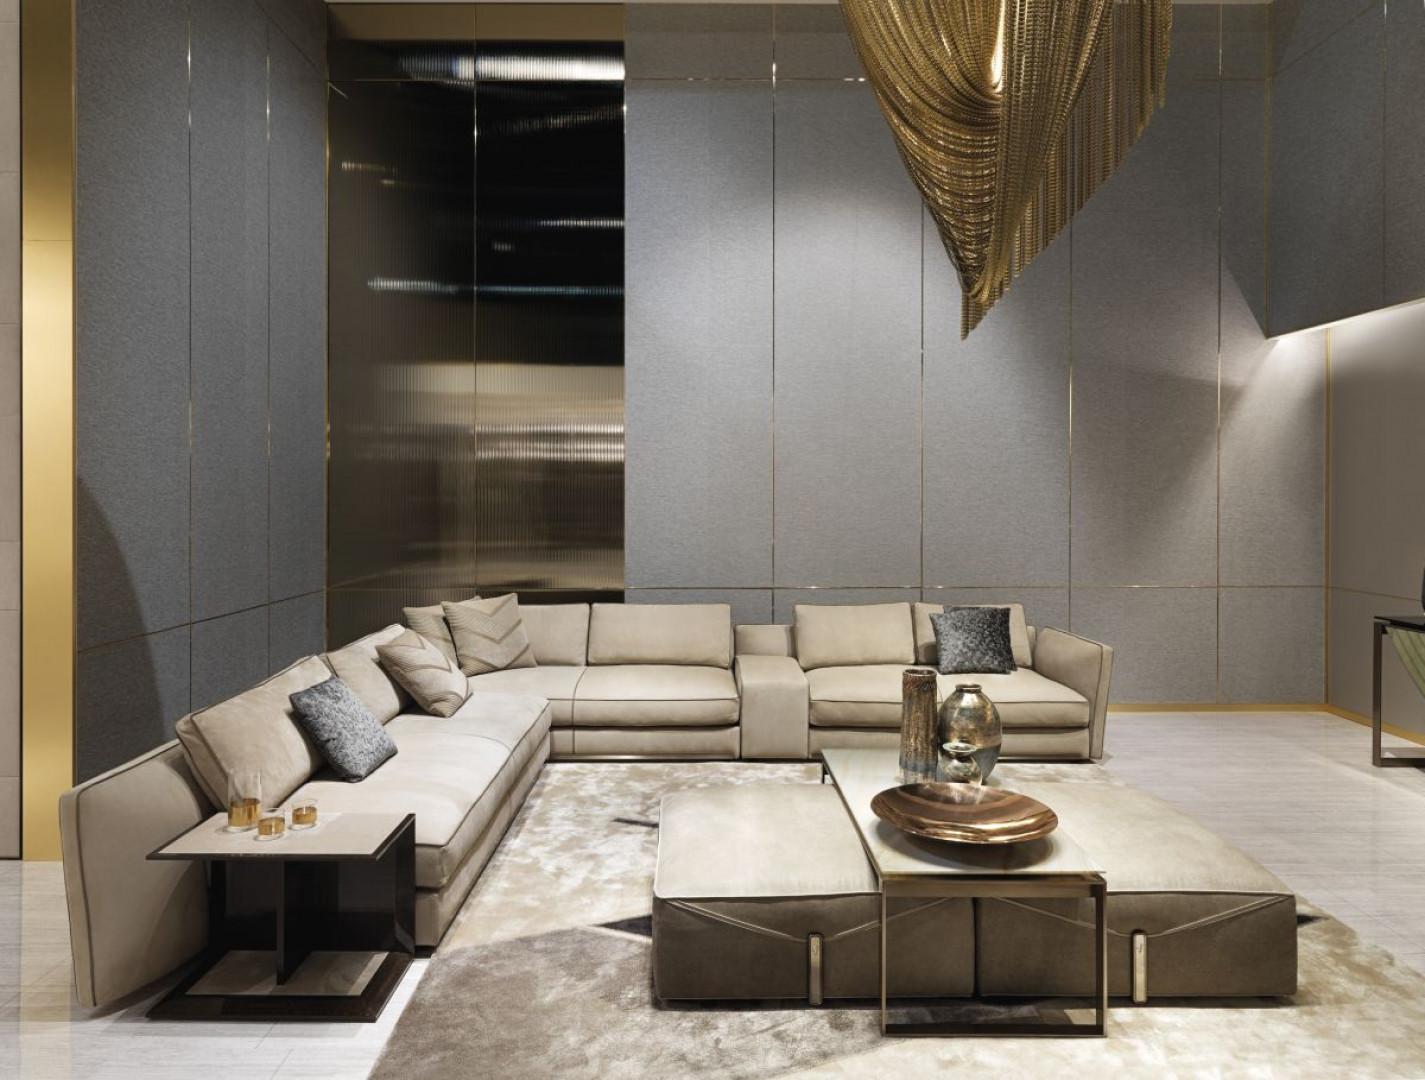 Kolekcja Bastian marki Visionnaire Home Philosophy. Projekt: Mauro Lipparini. Fot. Visionnaire Home Philosophy